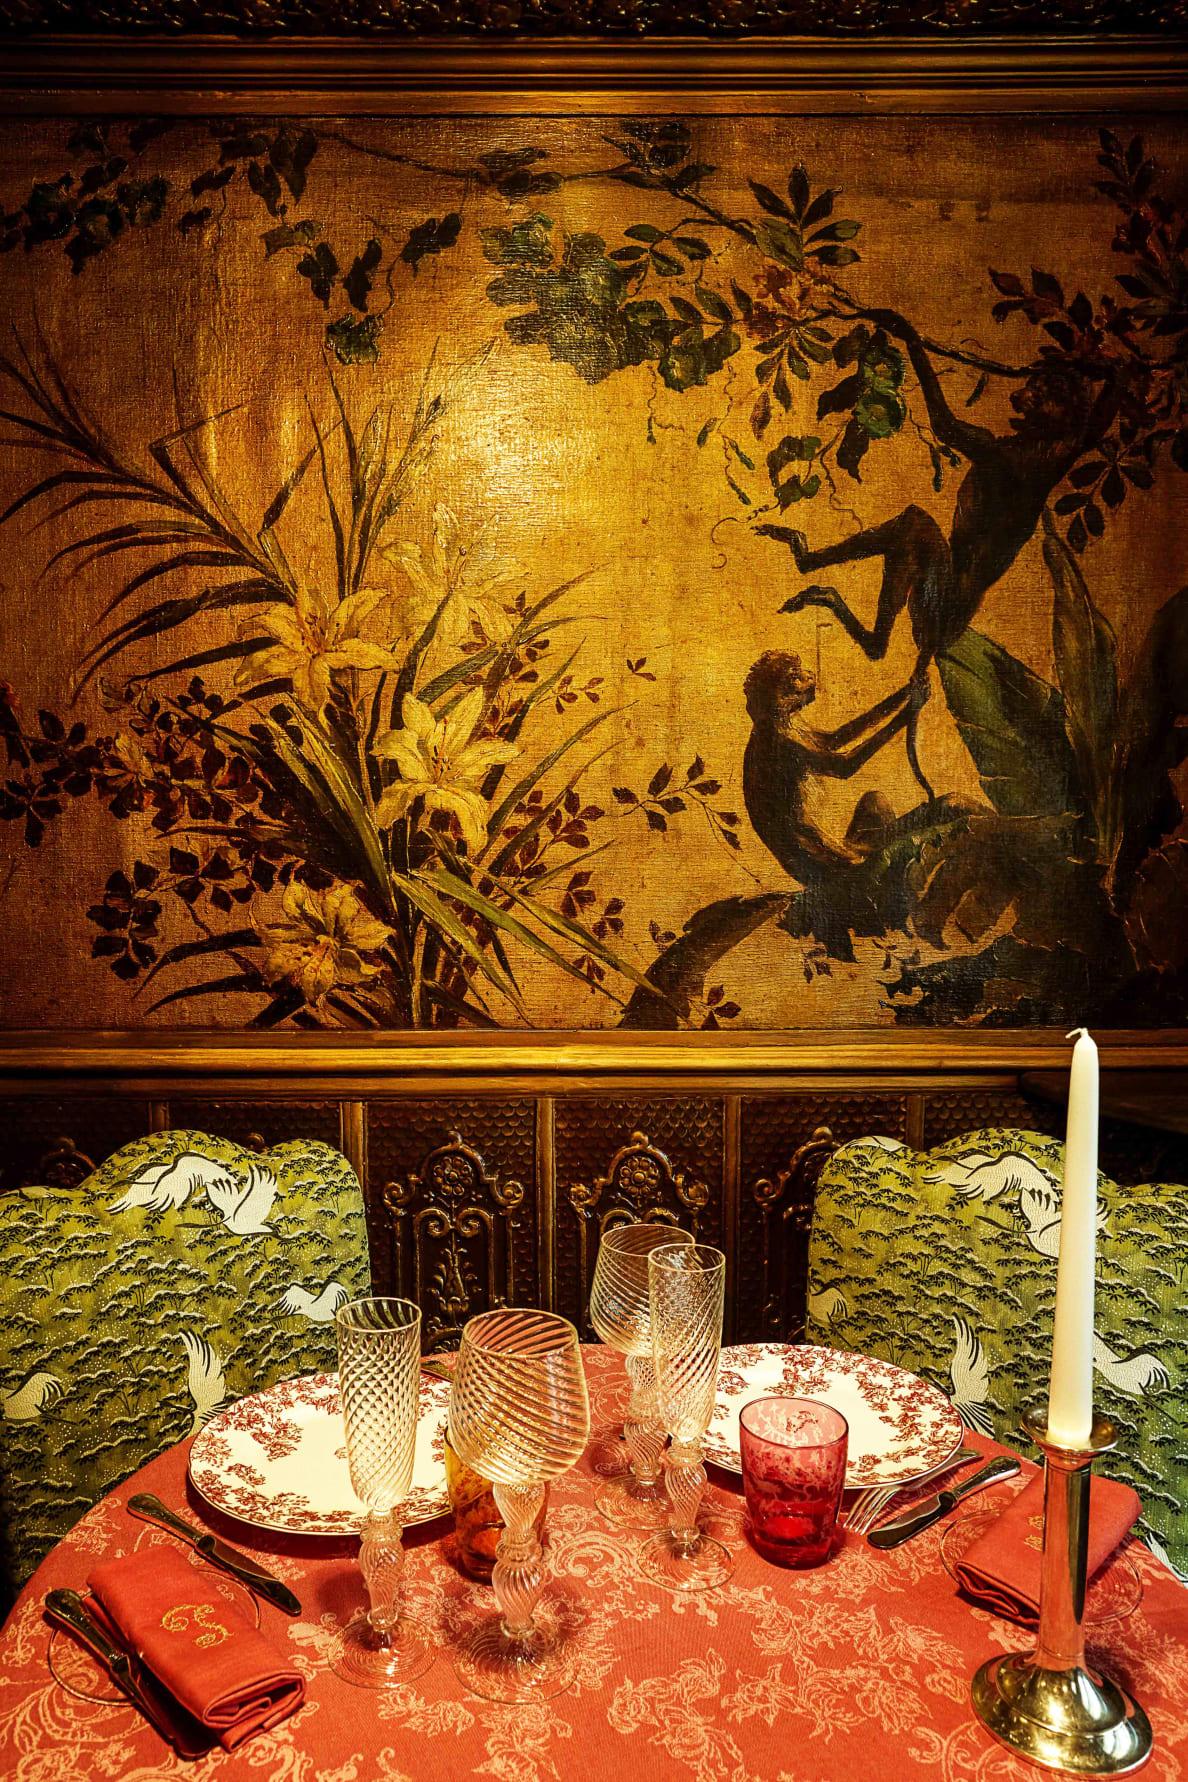 190728-Zaleski-paris-sex-restaurant-embed-9_xepmpw